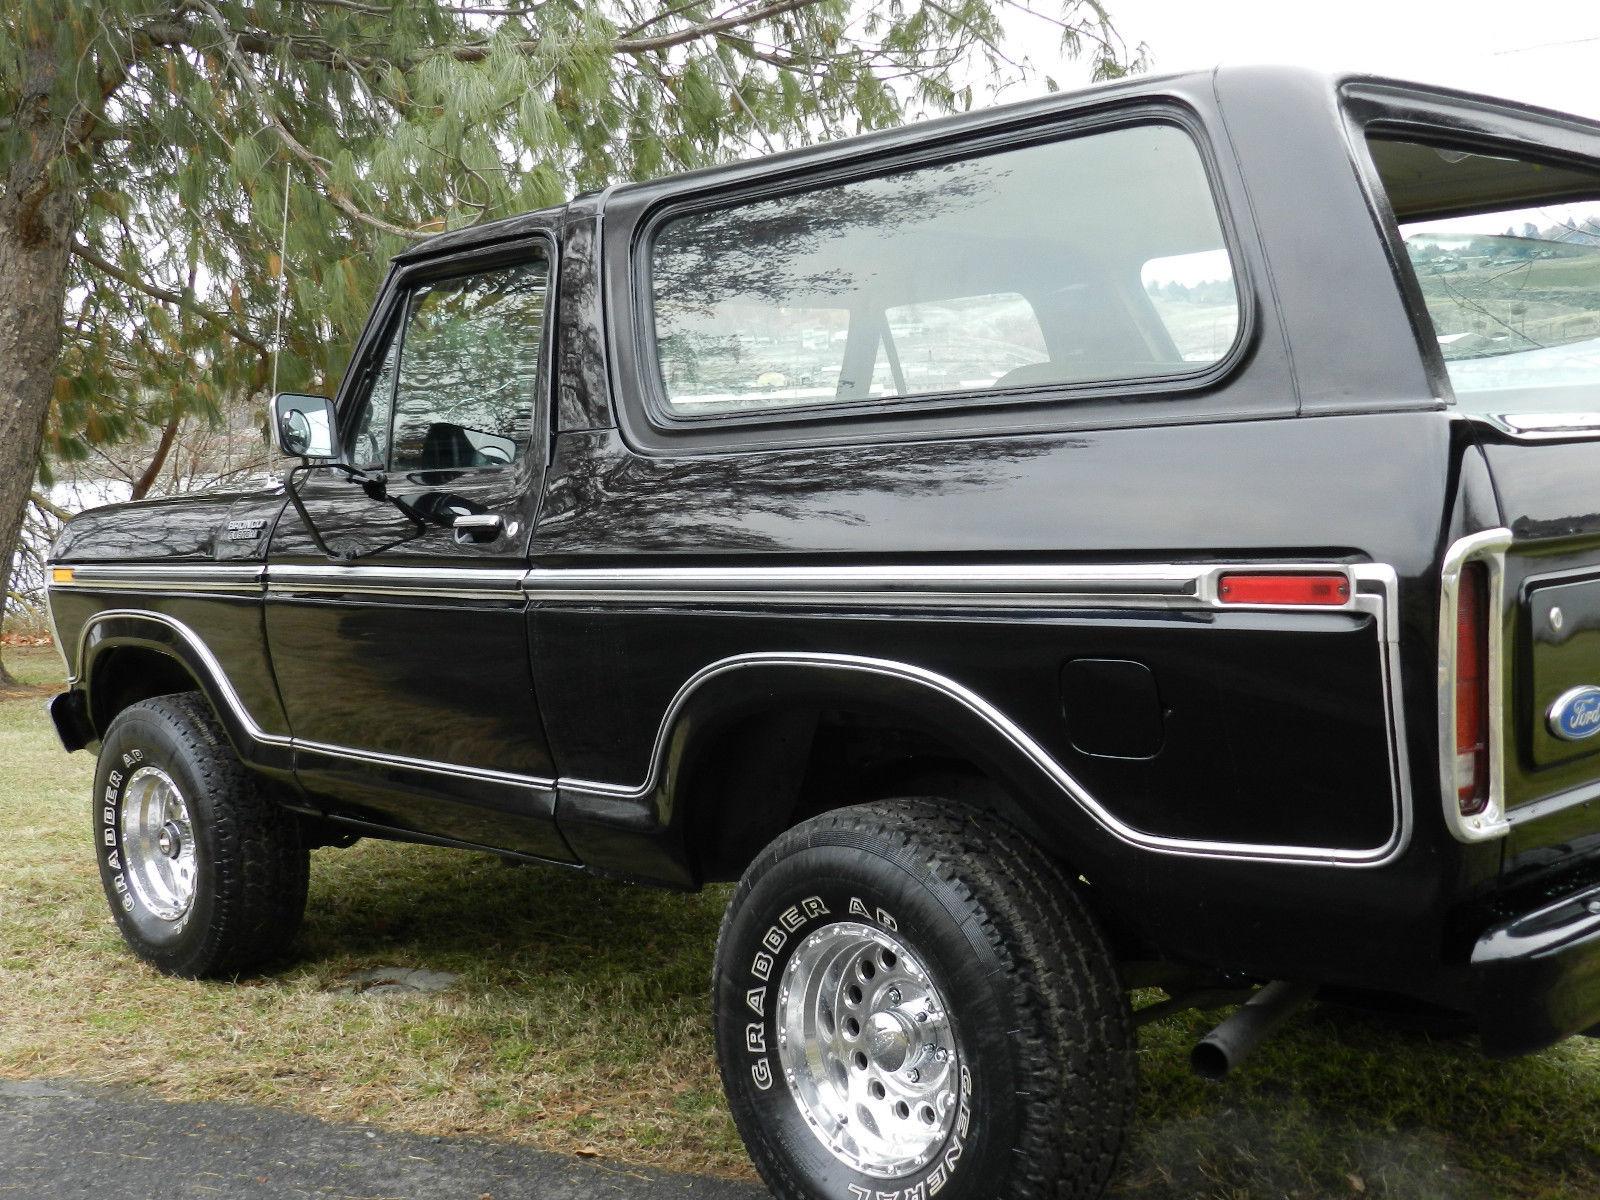 ford f150 bronco wiring diagram kia carnival 1979 4x4 xlt black on classic solid